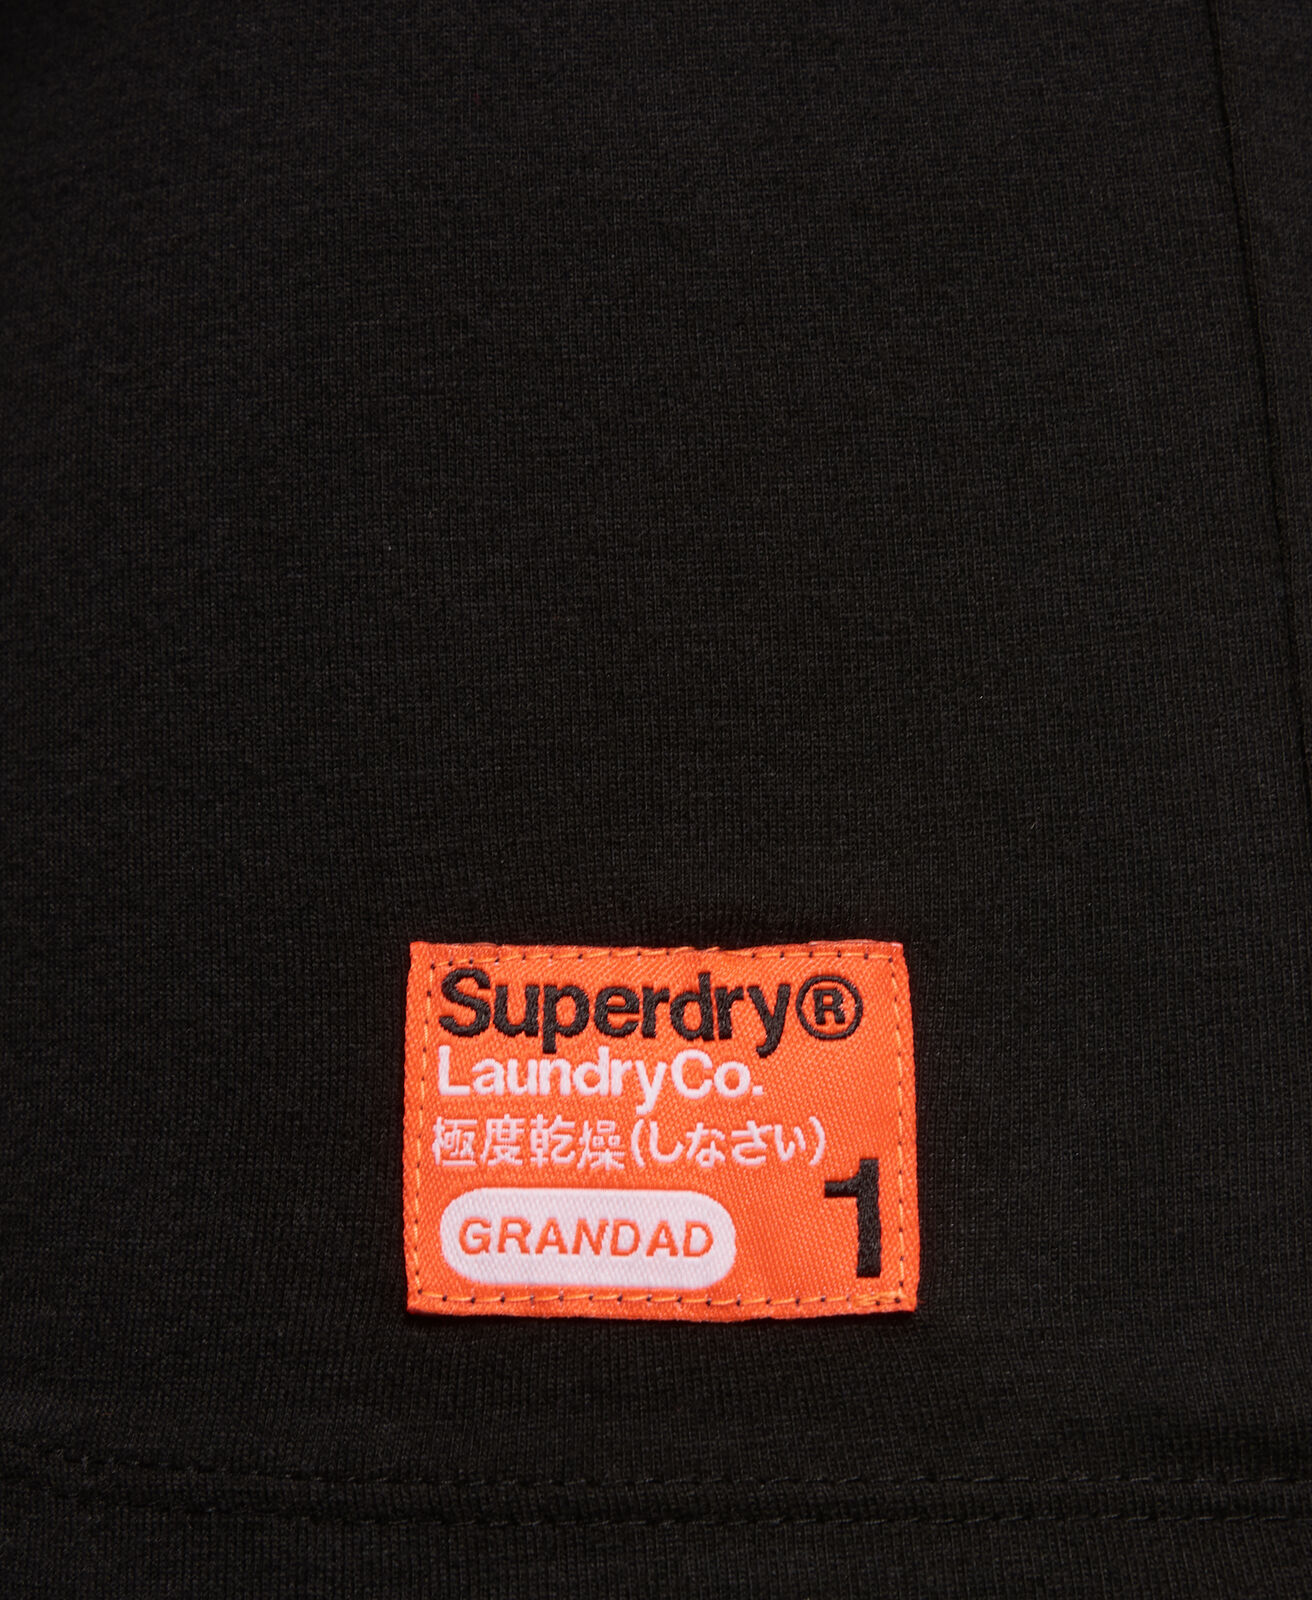 Mens-Superdry-Laundry-Organic-Cotton-Grandad-Top-Laundry-Black thumbnail 9